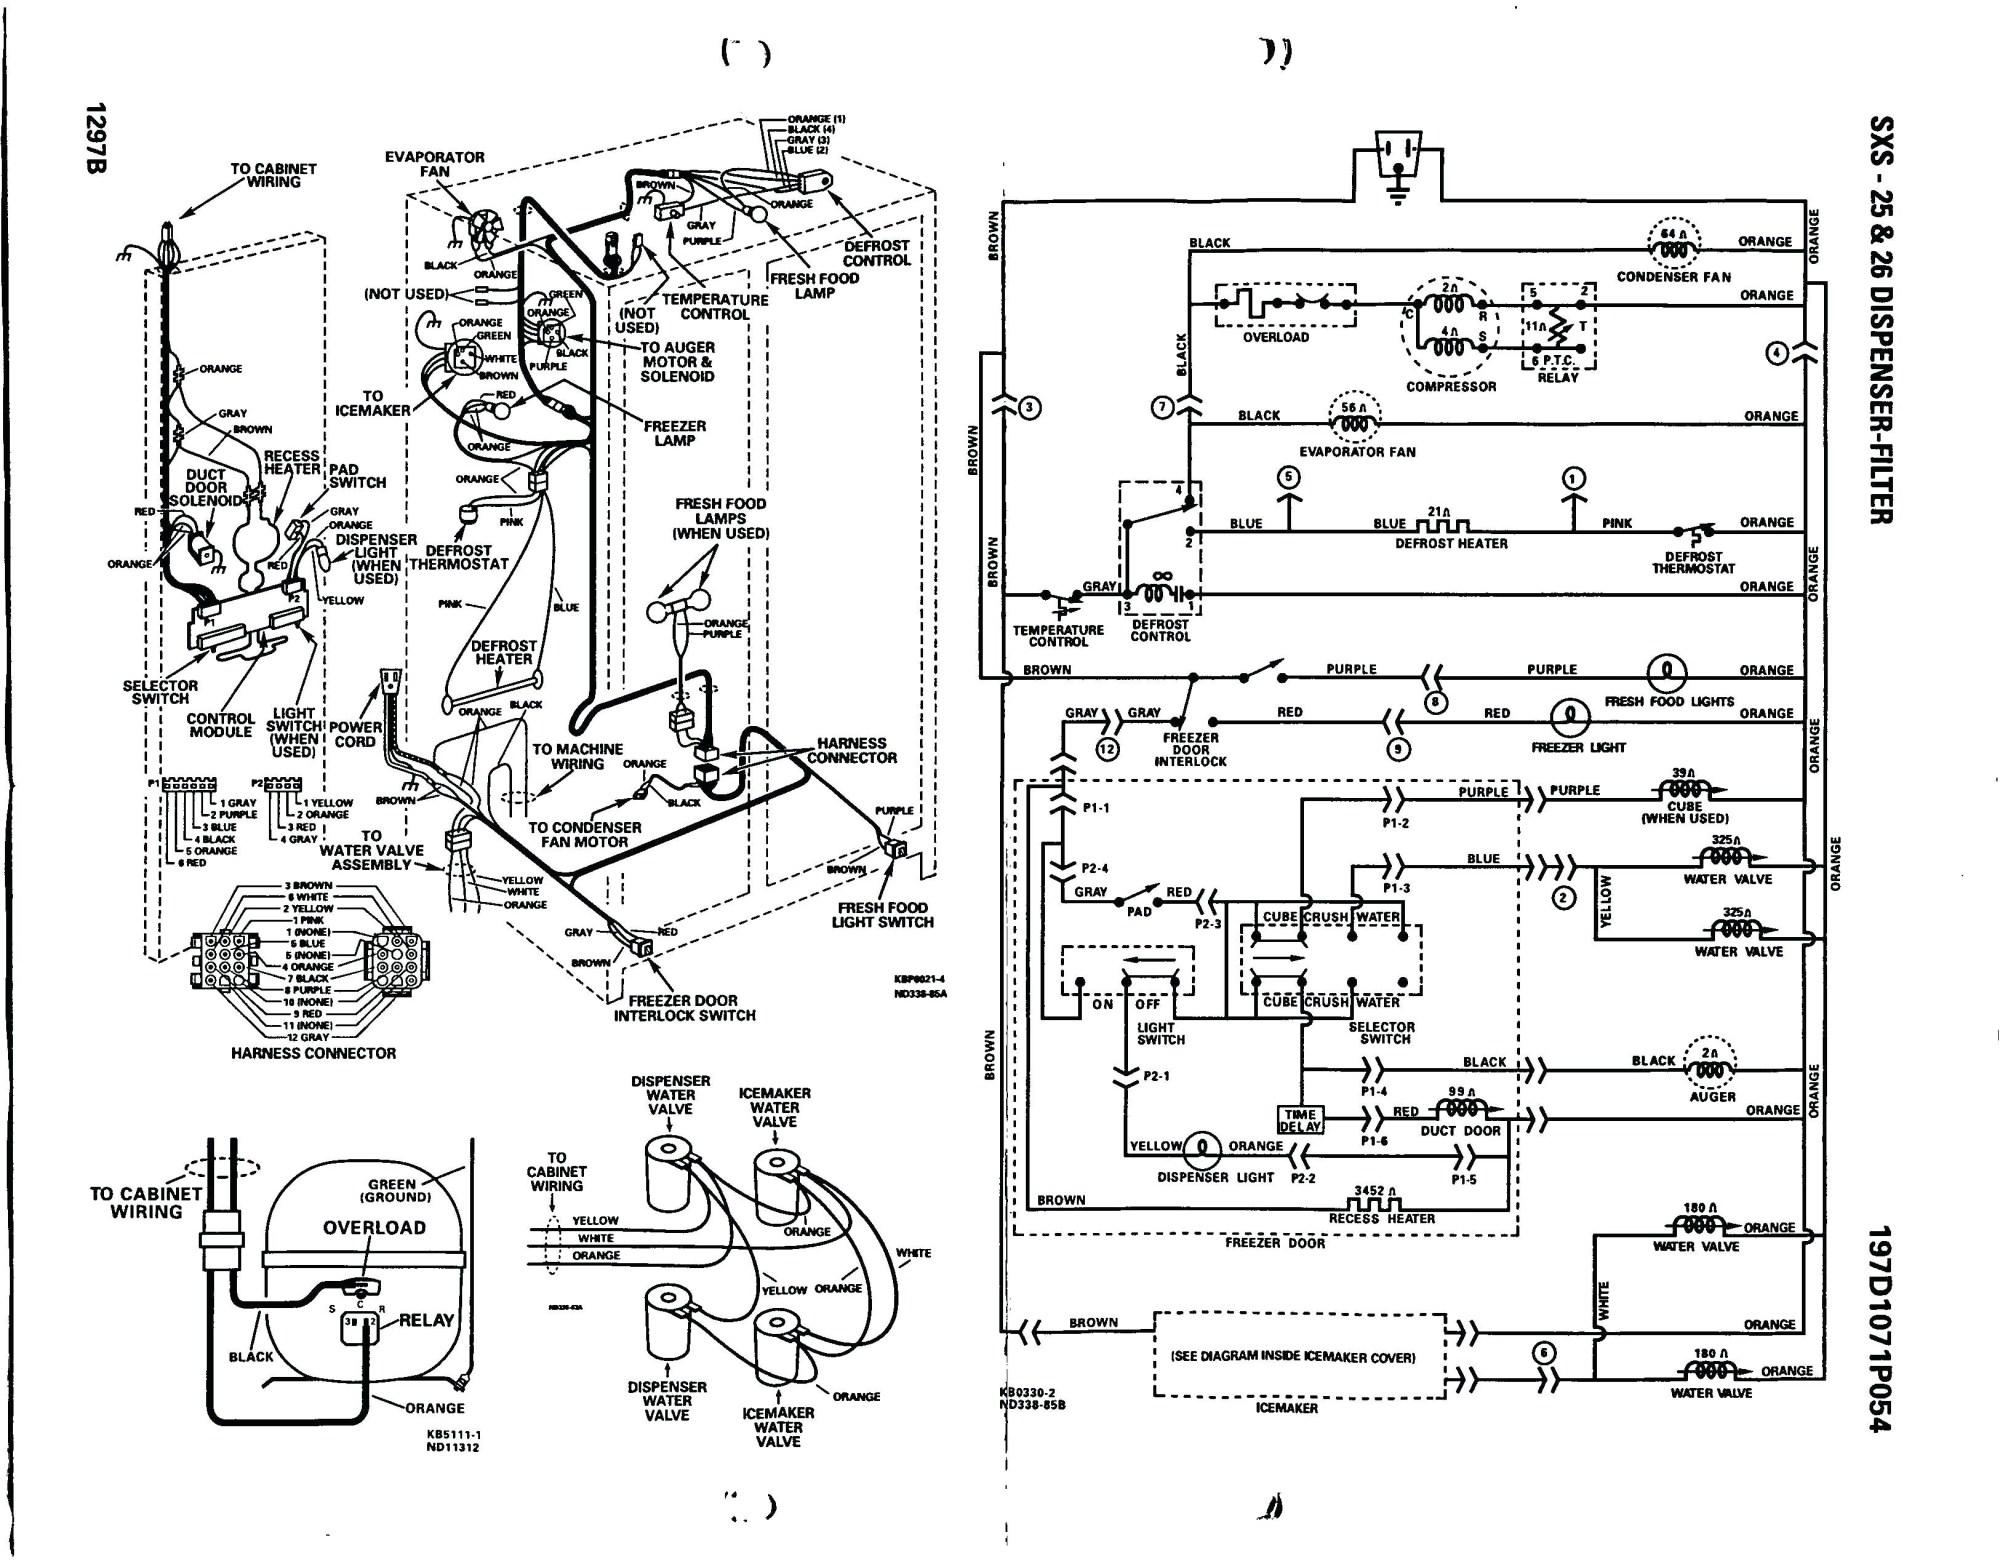 hight resolution of frigidaire refrigerator wiring diagram wiring diagram for zanussi fridge freezer inspirationa wiring diagram for frigidaire